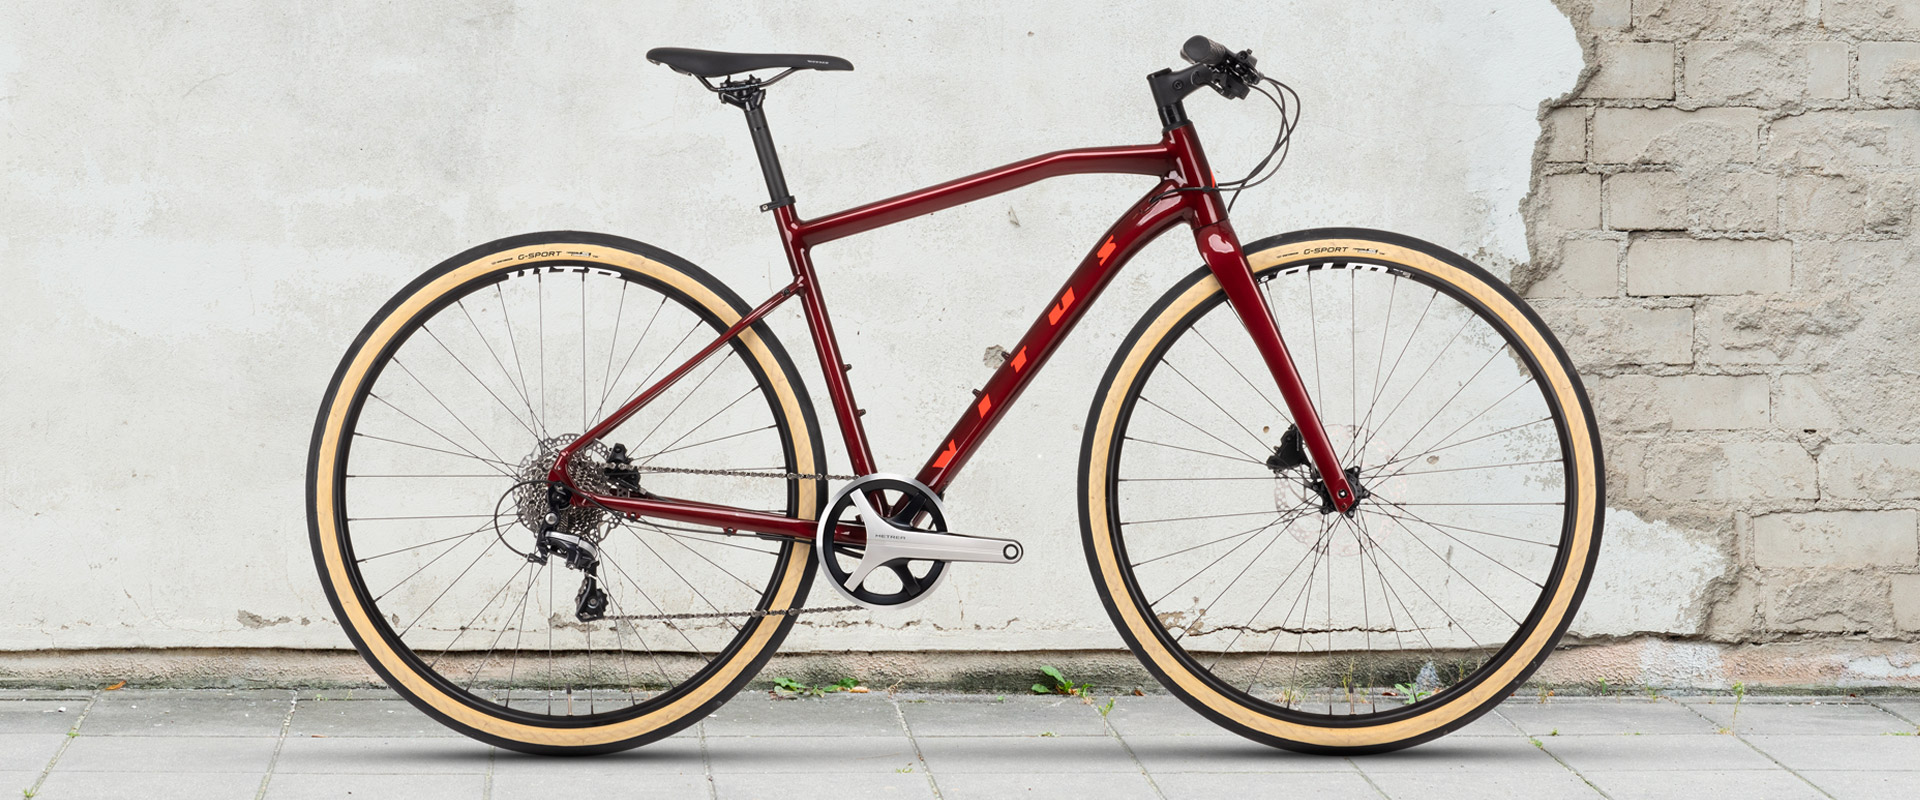 Vitus Mach 3 VRX Urban Bike Metrea